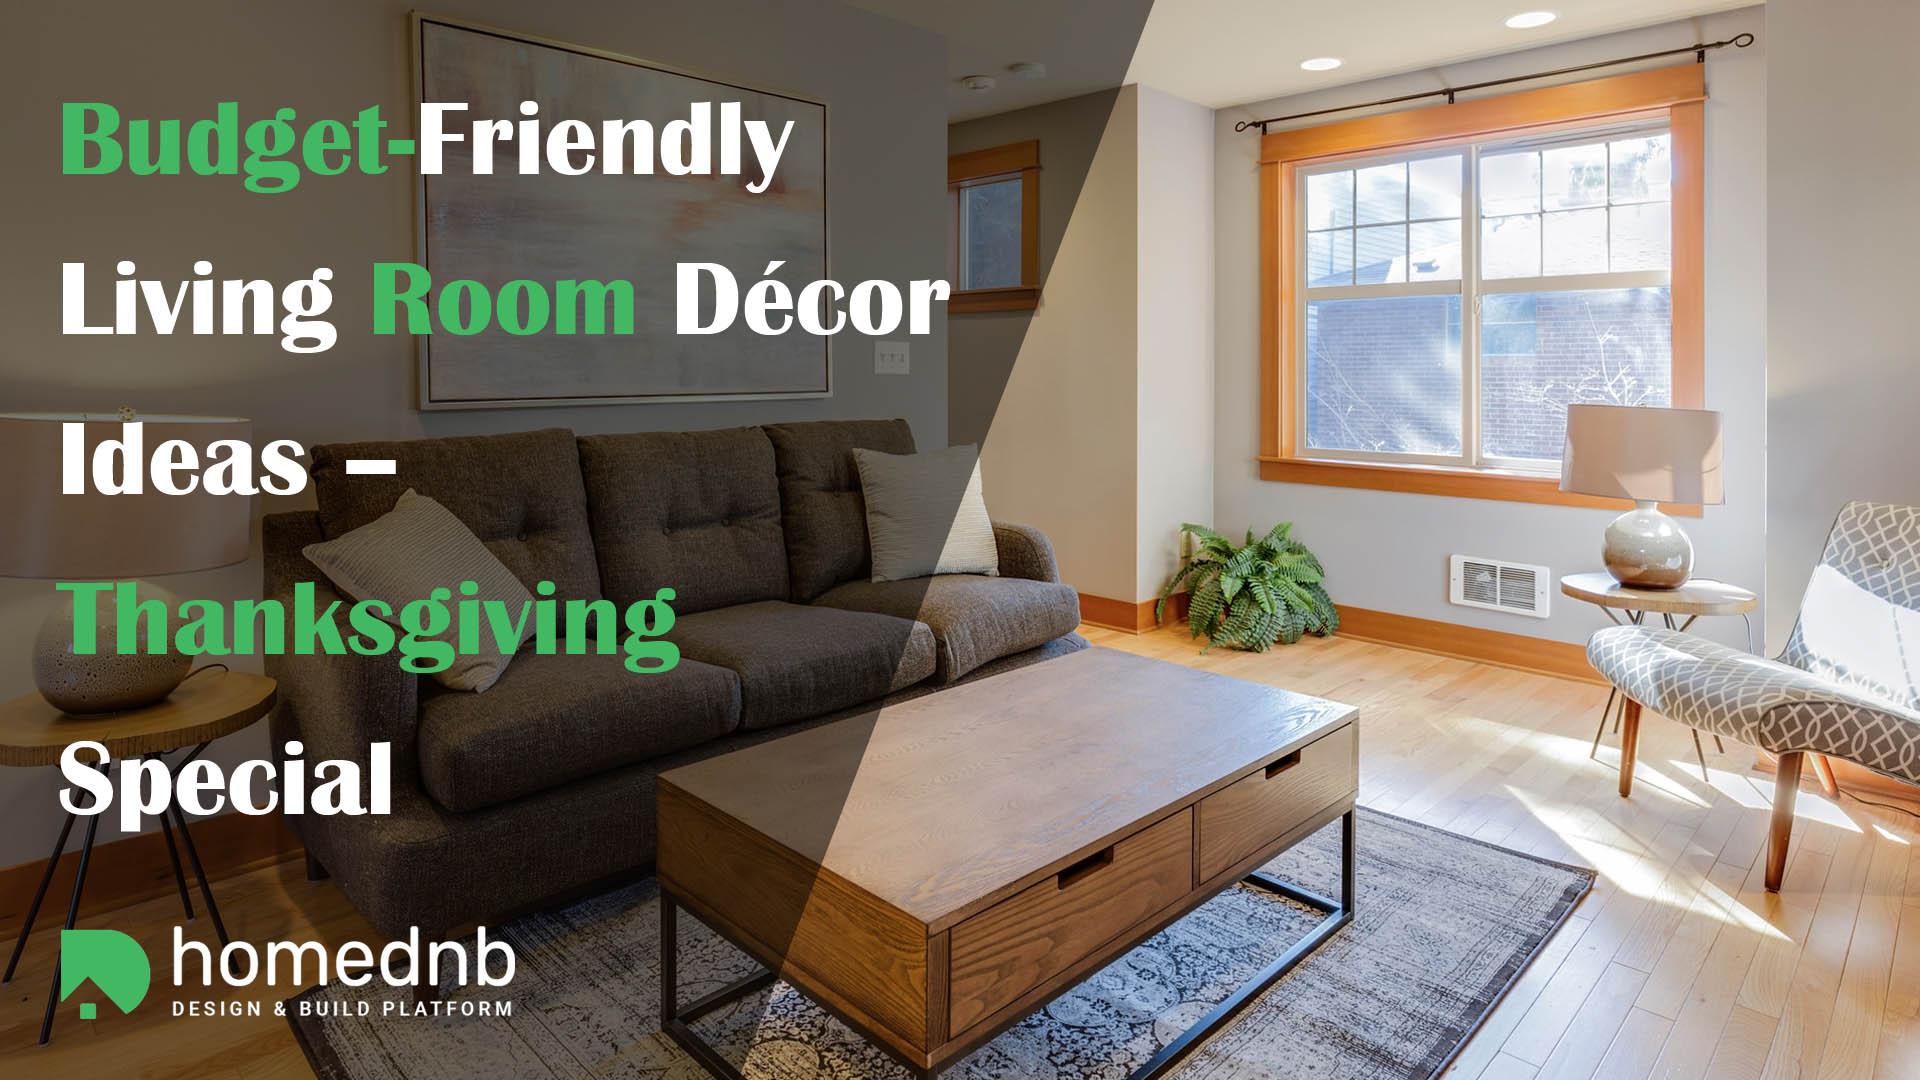 Budget-Friendly Living Room Decor Ideas – Thanksgiving Special